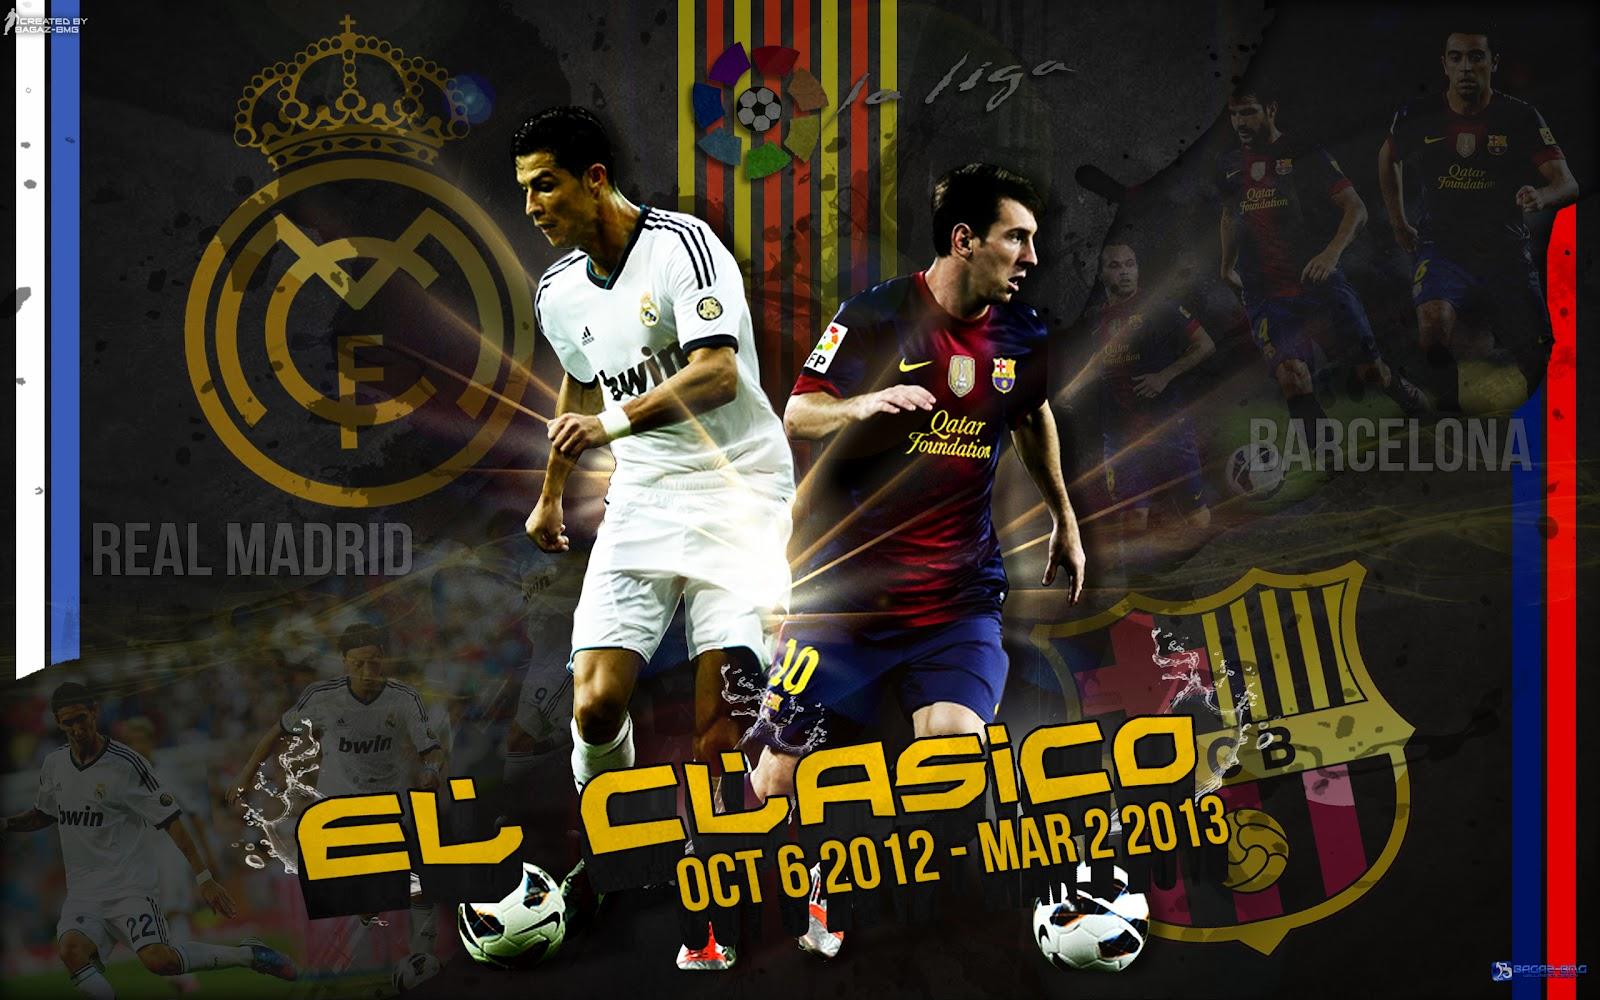 Real Madrid Vs Barcelona Wallpaper - El Clasico Wallpapers Hd , HD Wallpaper & Backgrounds